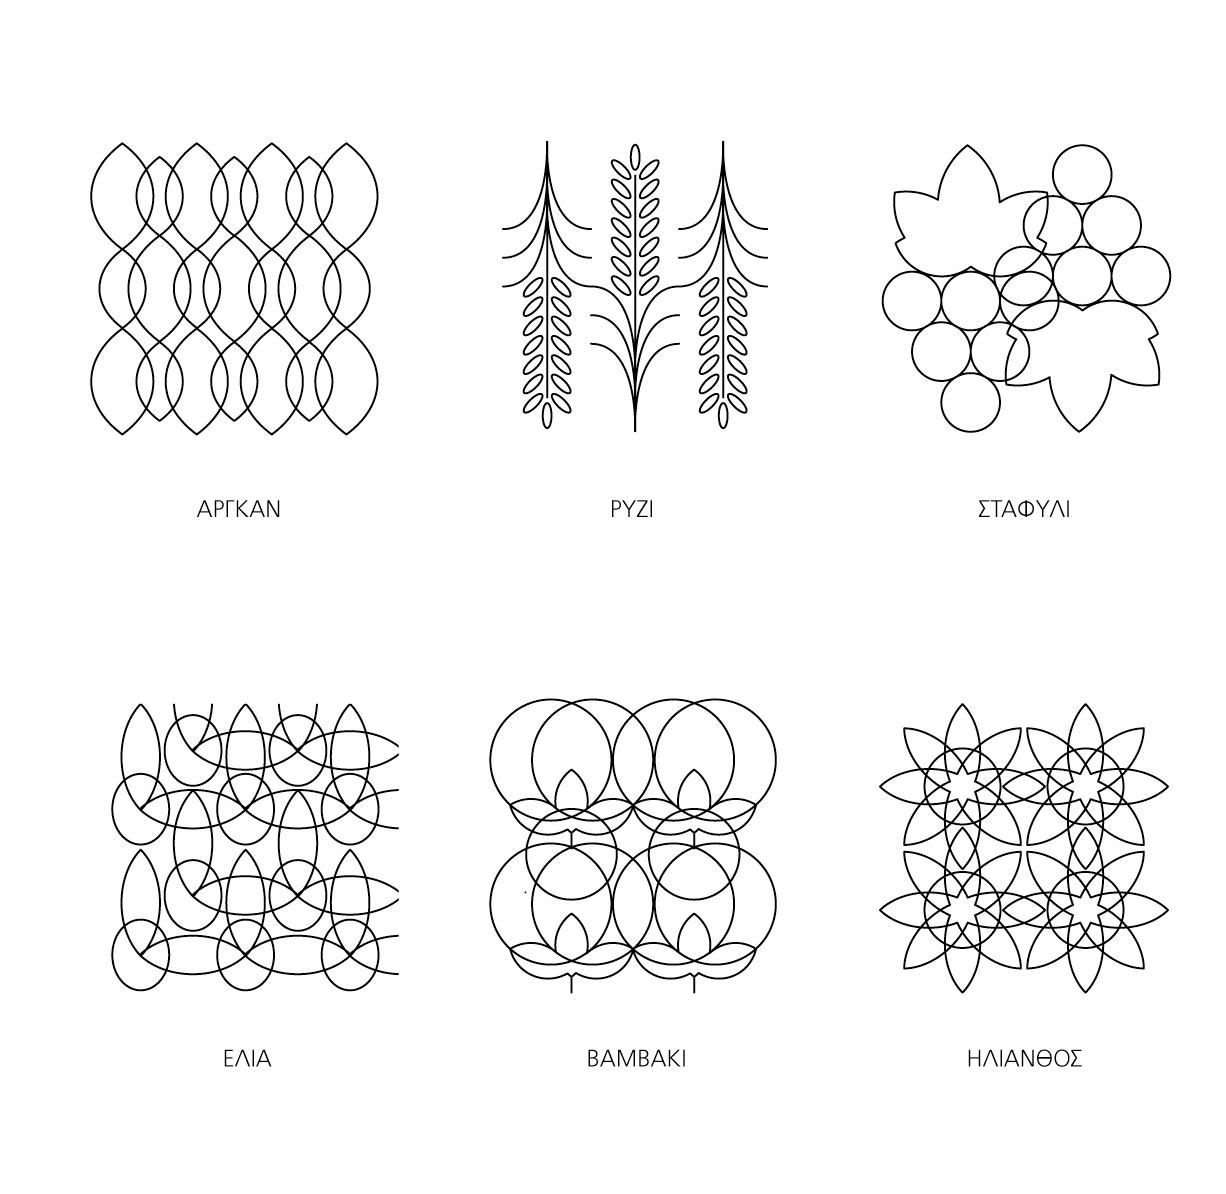 A3-DESIGN-MACROVITA-NEW-IDENTITY